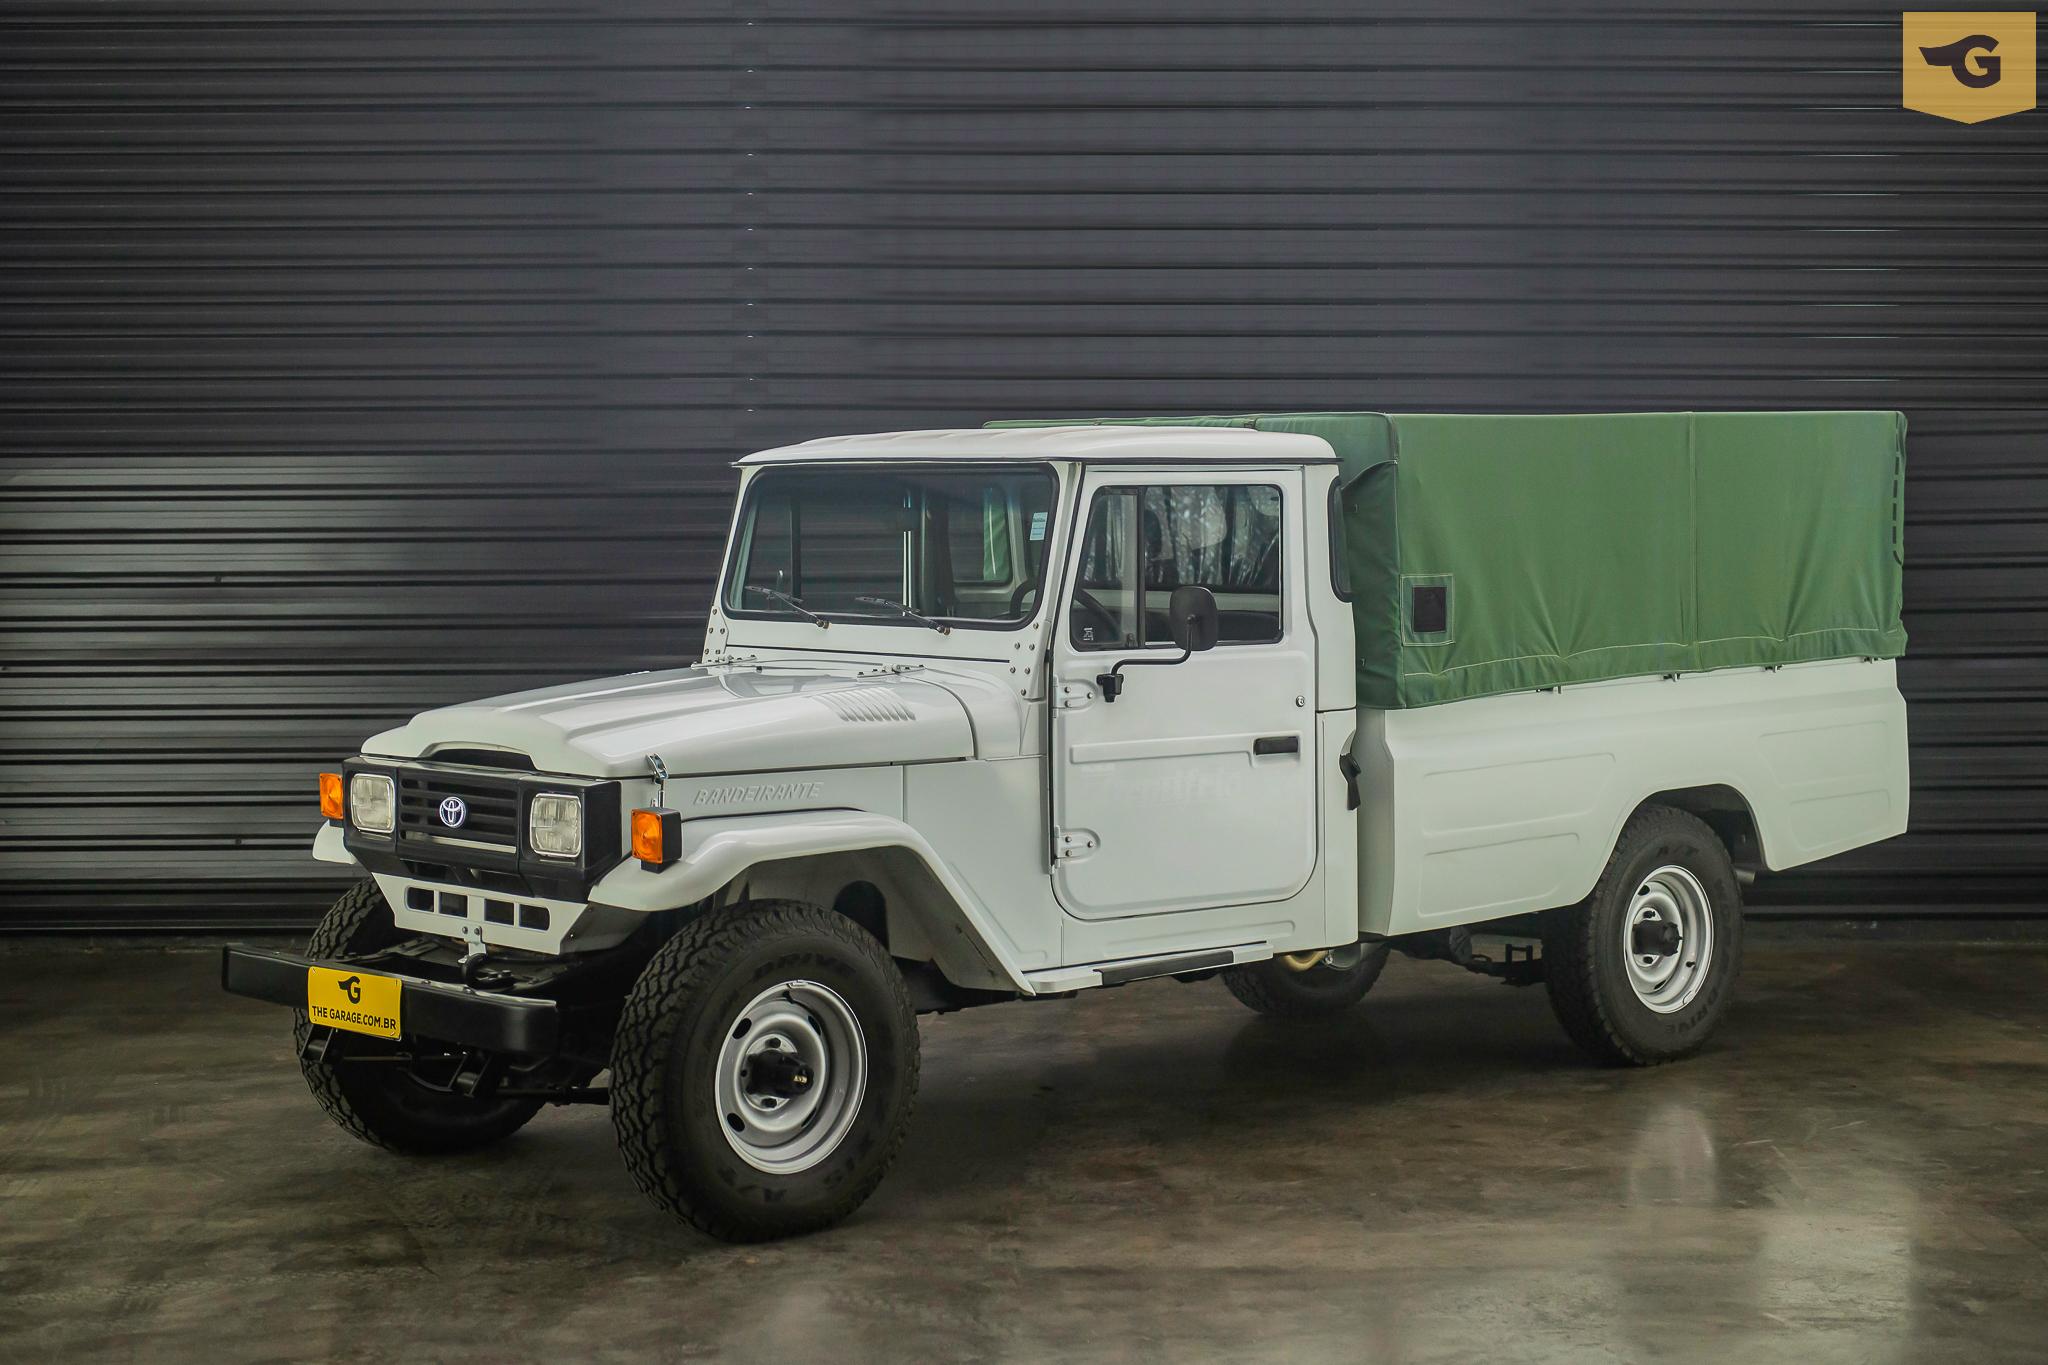 1999-Toyota-bandeirante-a-venda-sao-paulo-sp-for-sale-the-garage-classicos-a-venda-loja-de-carros-antigos--26